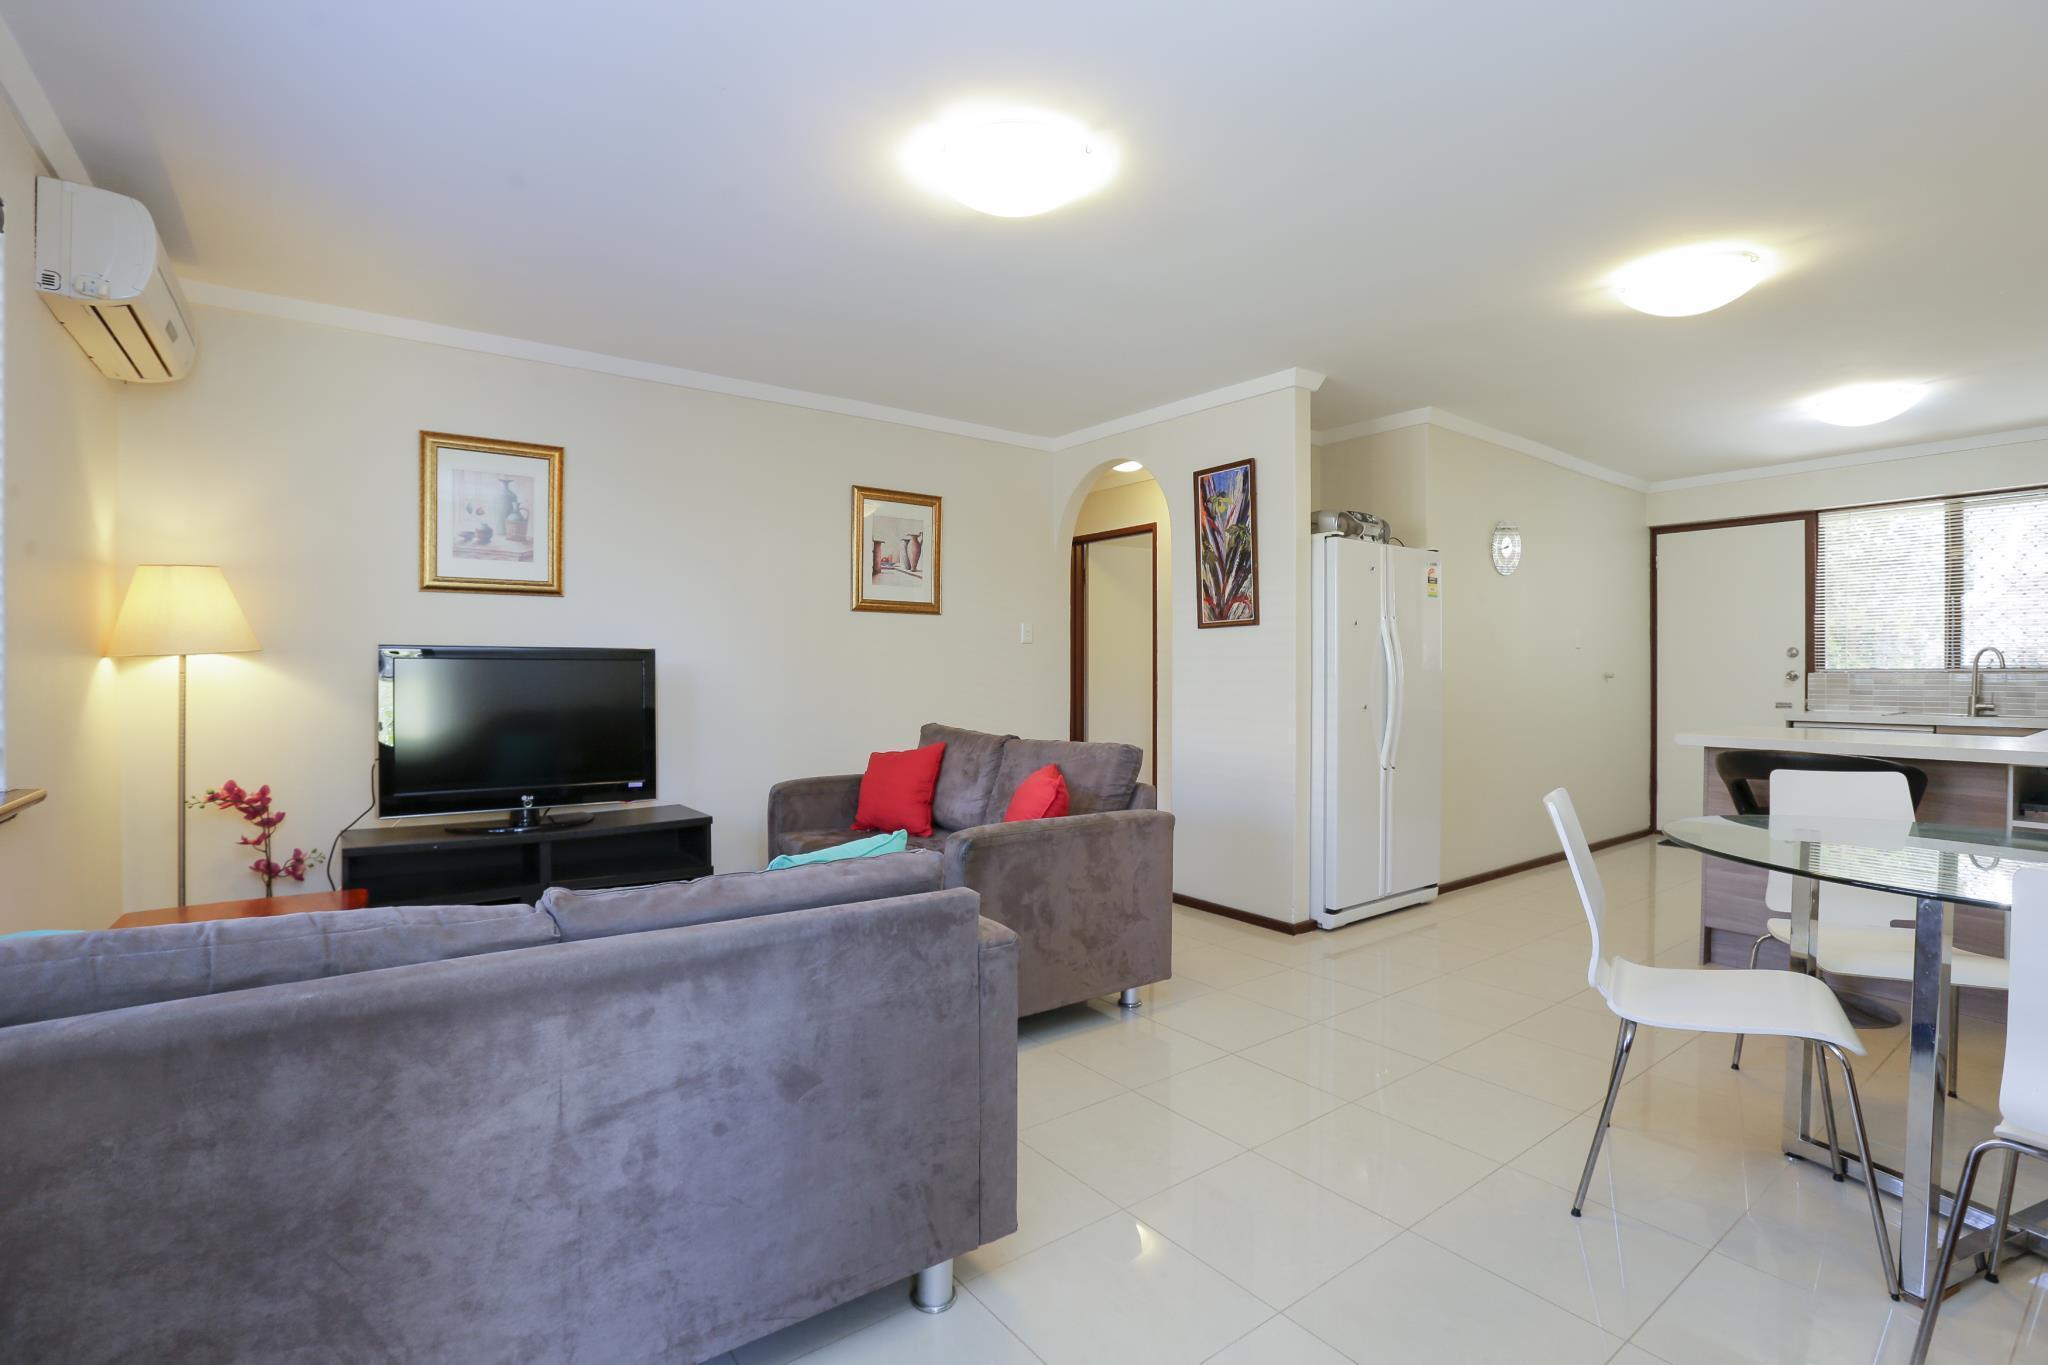 parkline apartments 6 perth in perth room deals photos reviews rh agoda com